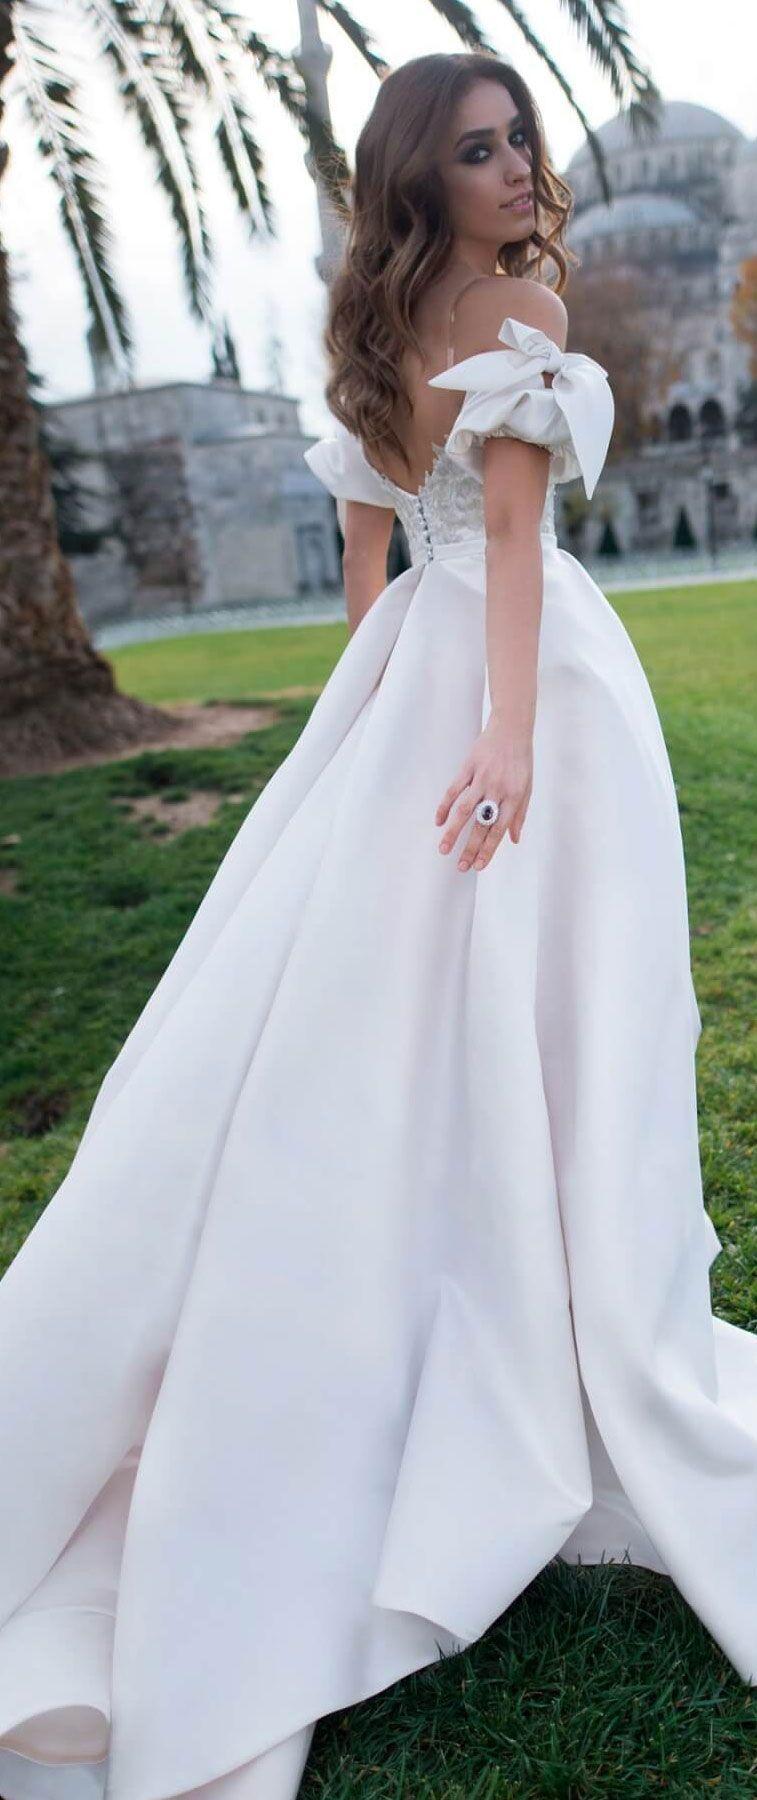 Detachable skirt wedding dress  BlammoBiamo Wedding Dresses  Wedding dress Wedding and Weddings